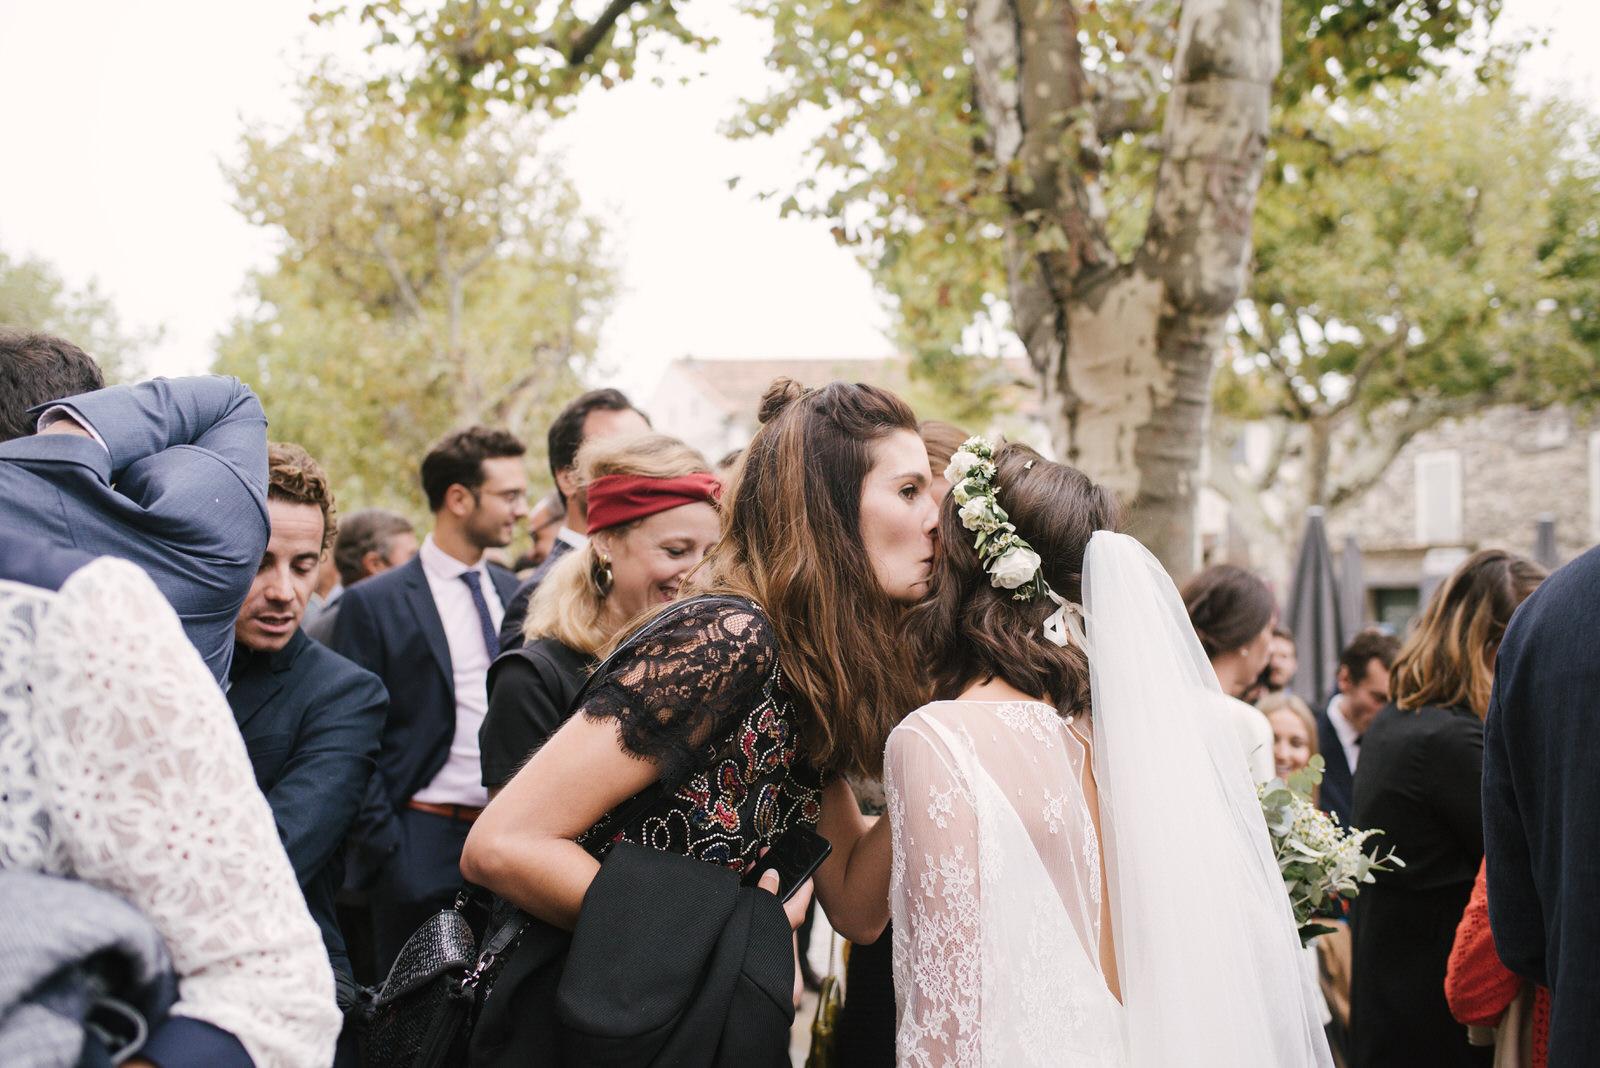 Lisebery photographe mariage famille grossesse entreprise grenoble lyon annecy chambery